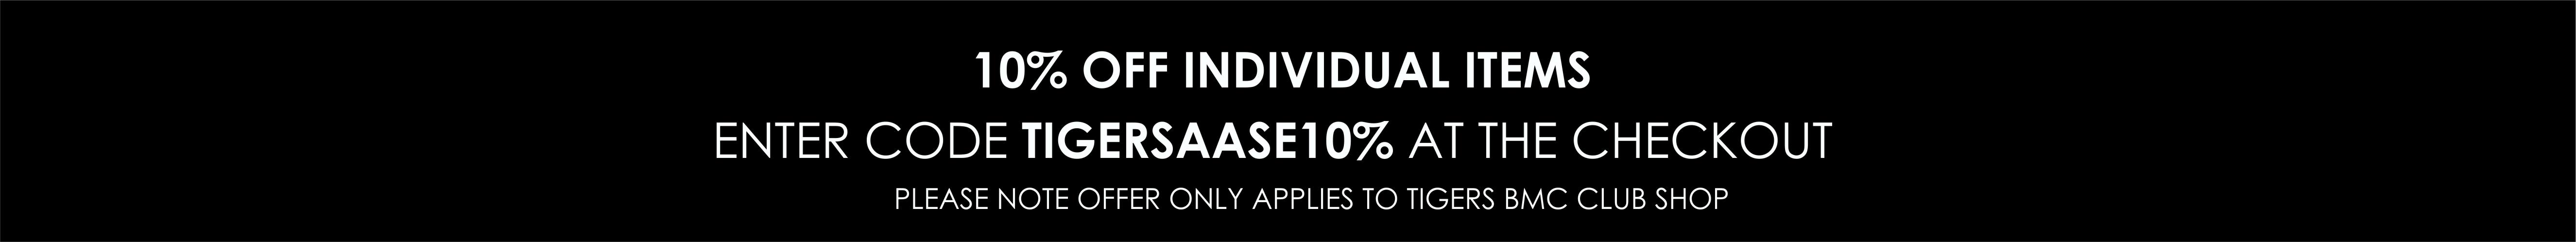 10-percent-off-banner.jpg